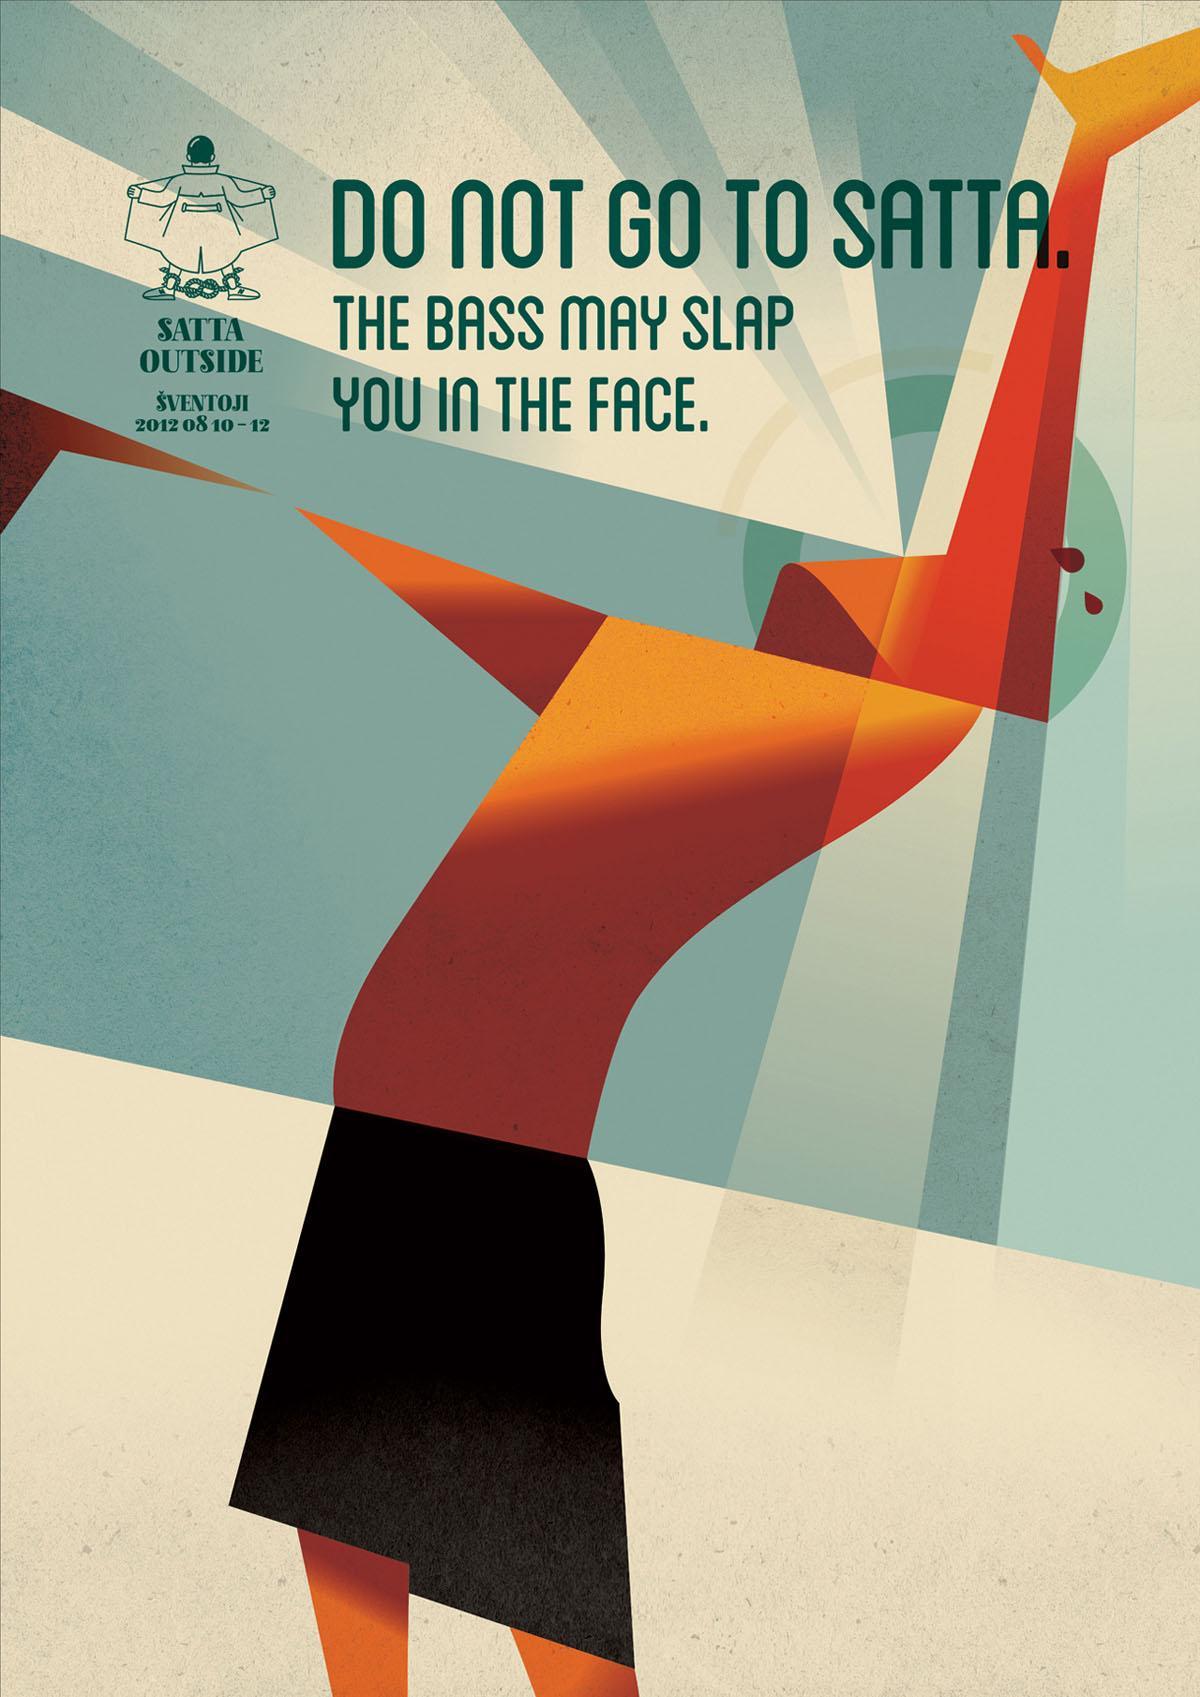 Satta Outside Festival Outdoor Ad -  Bass